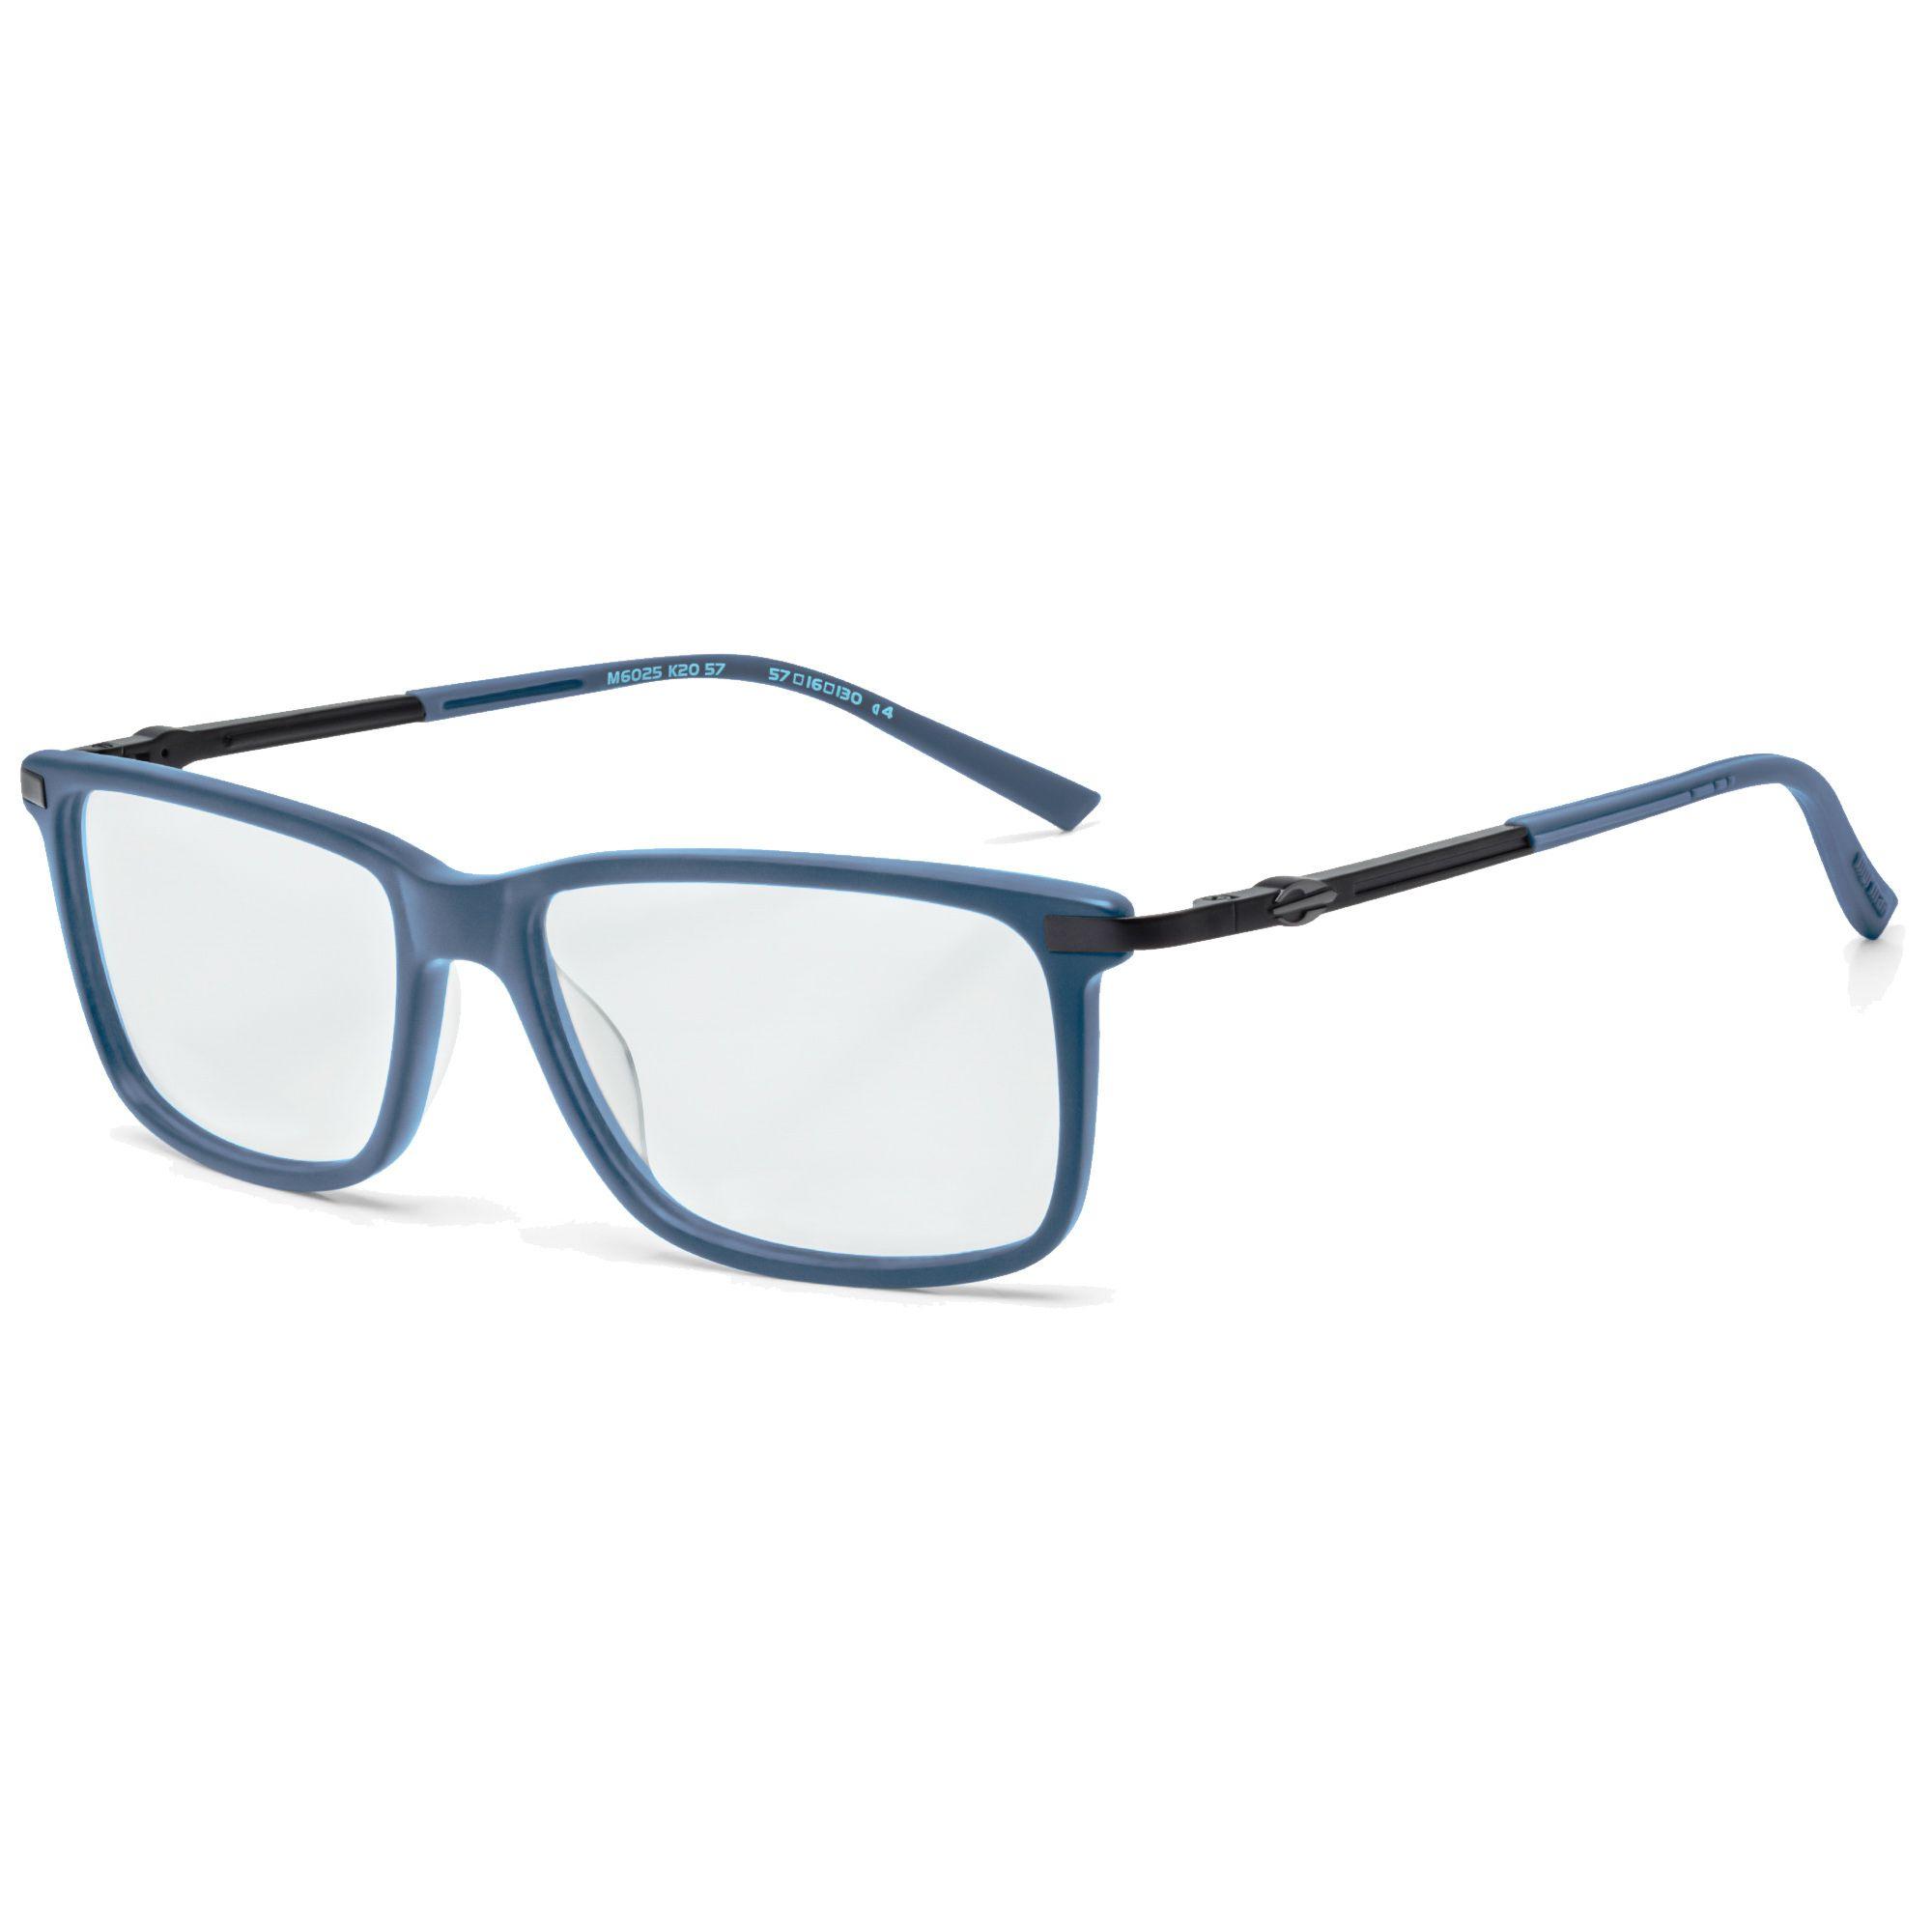 Óculos de Grau Unissex Mormaii M6025K2057